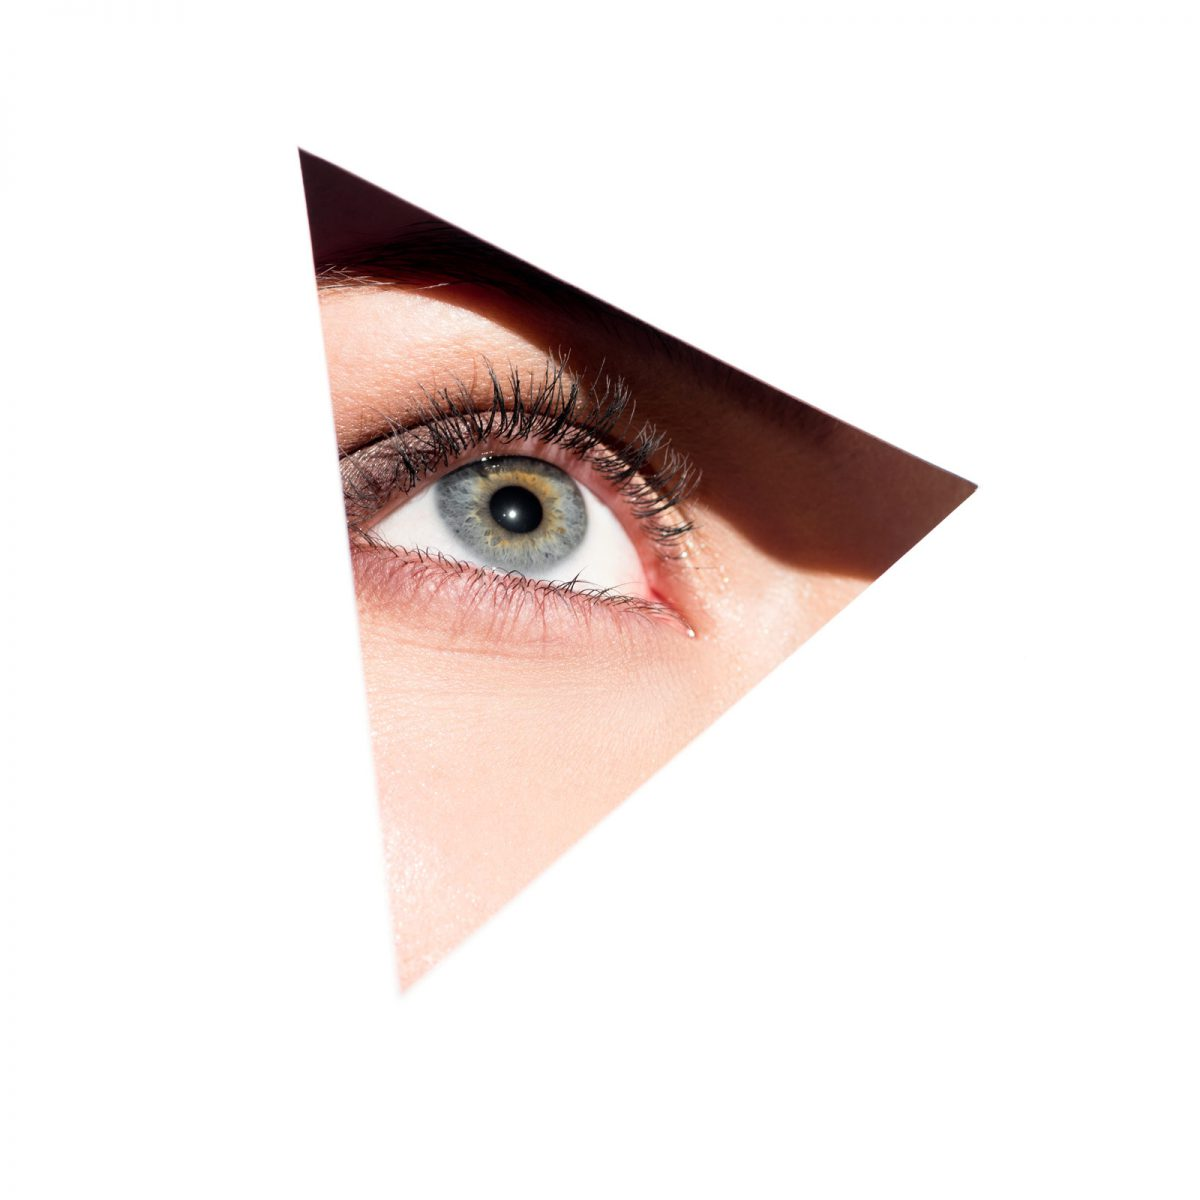 eyemazy iris fotografie in Herne bei Brillenstudio Focus